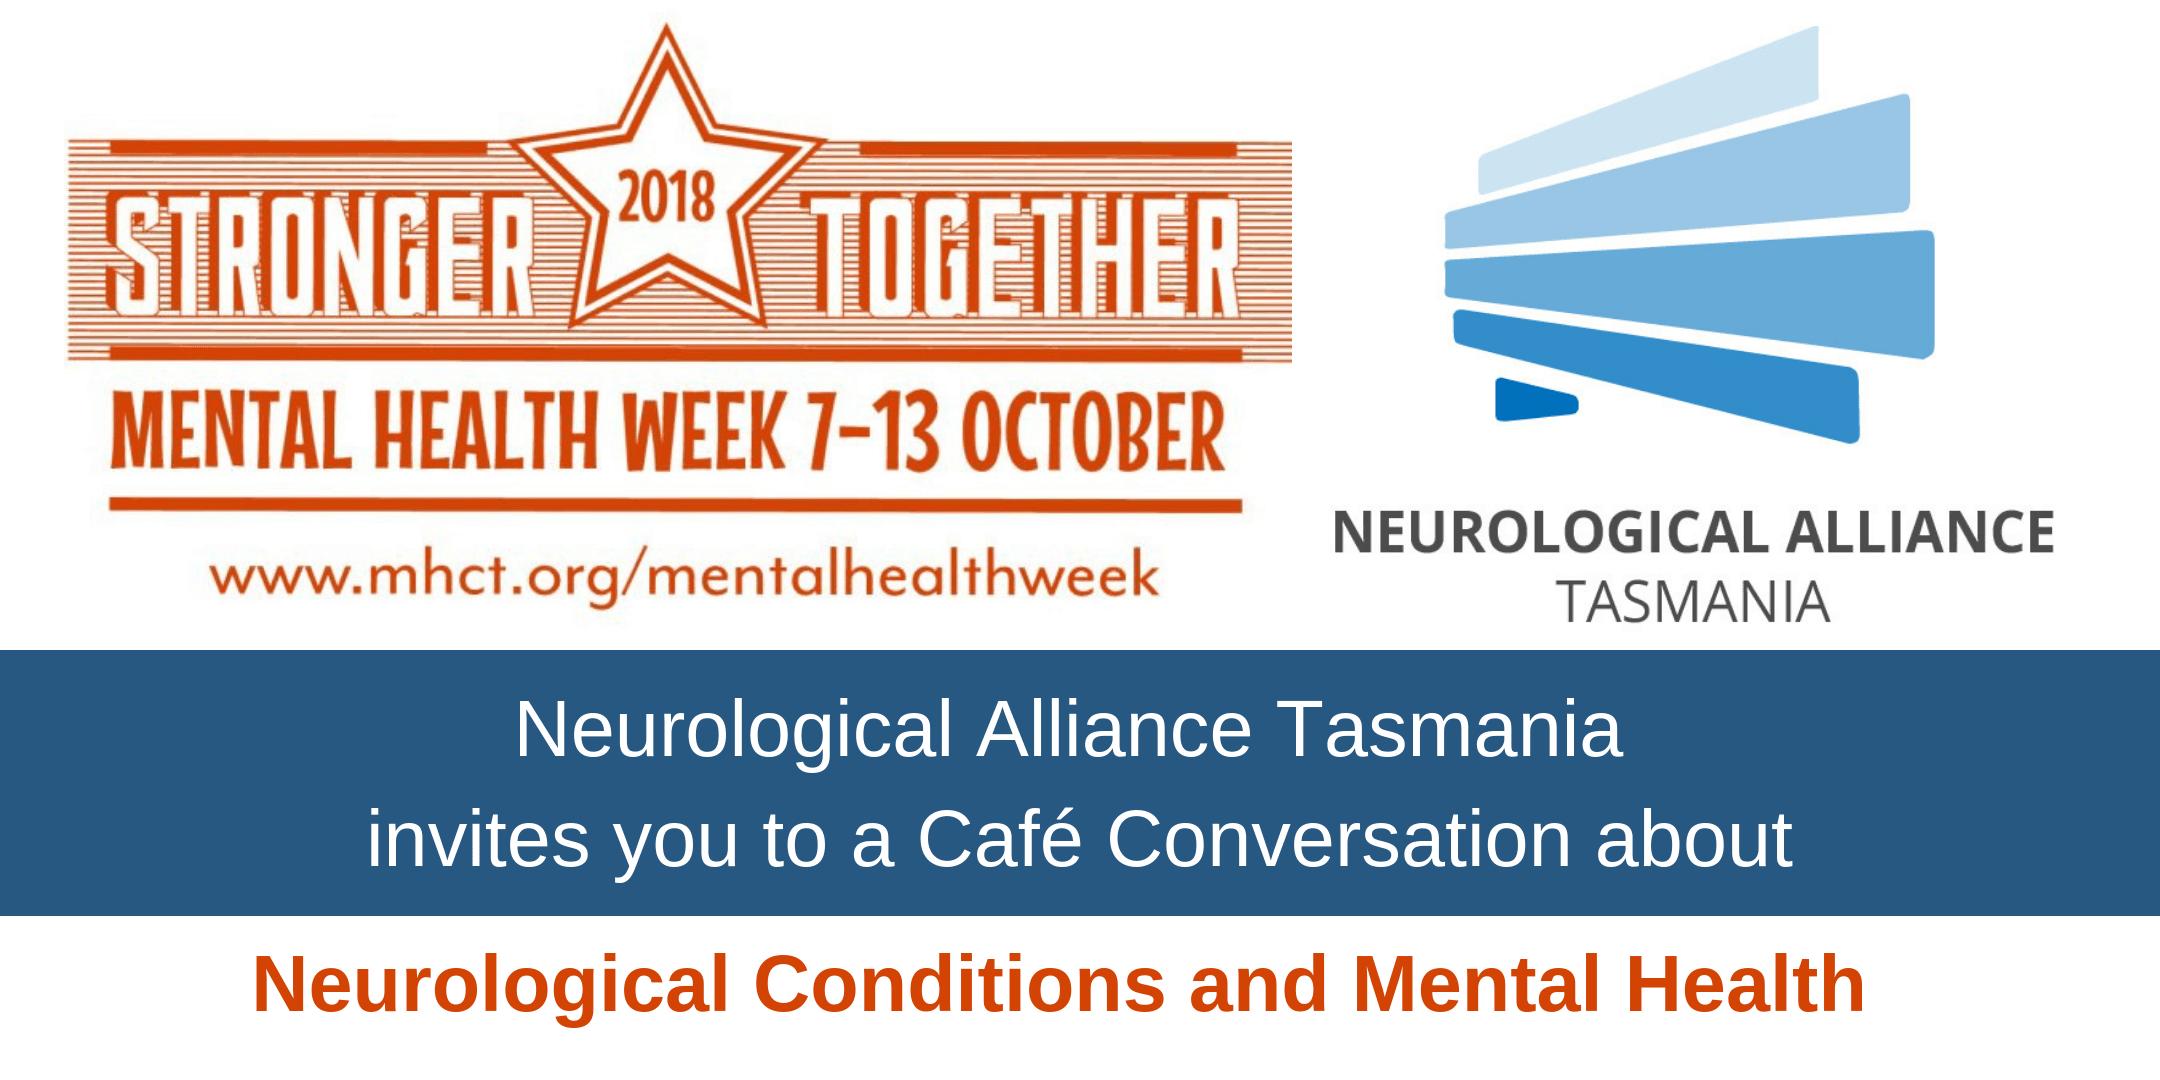 Neurological Alliance Tasmania invites you to a Café Conversation about Neurological Conditions and Mental Health